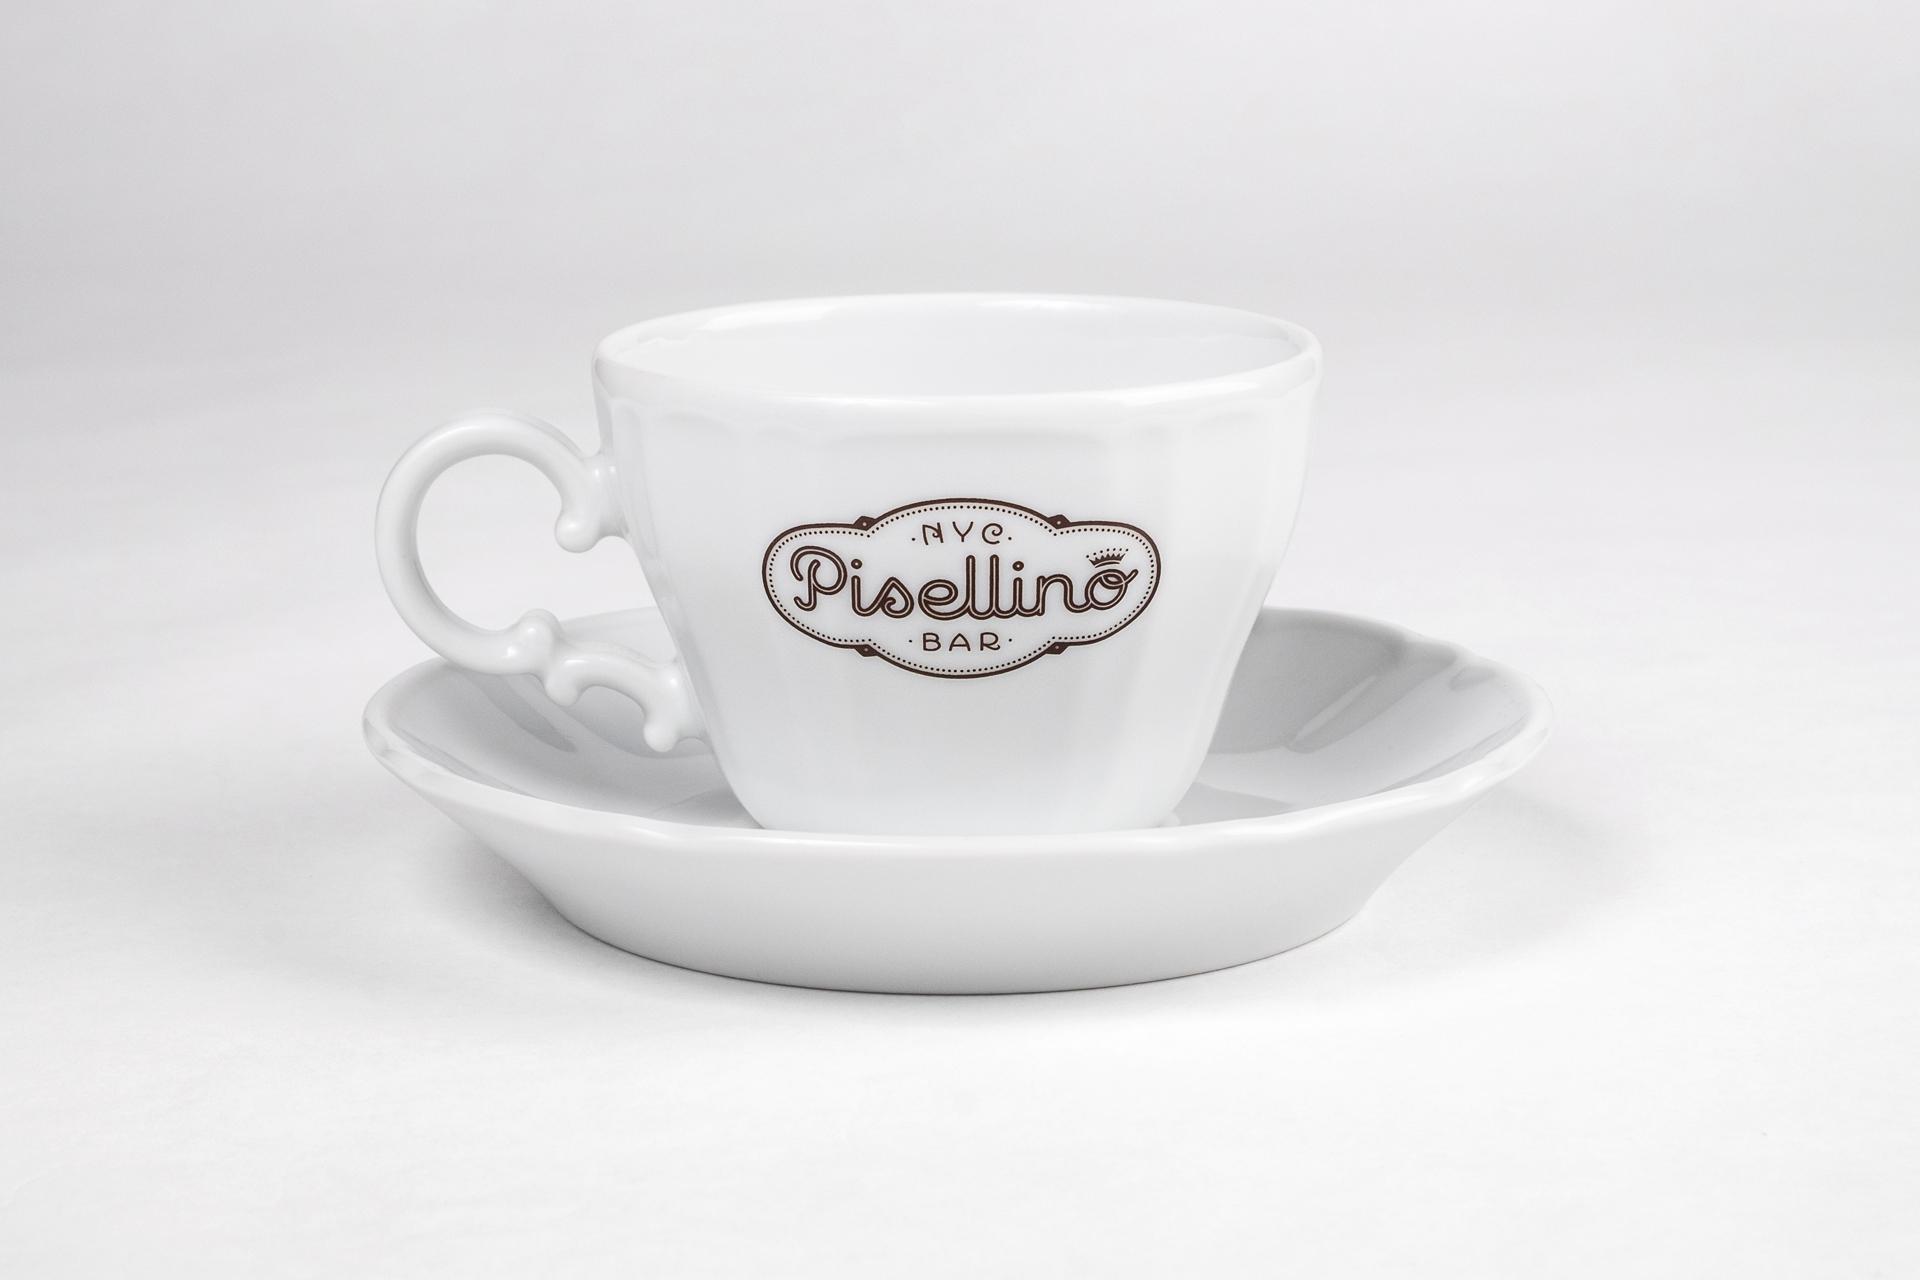 Pisellino_Cup_01_72dpi.jpg